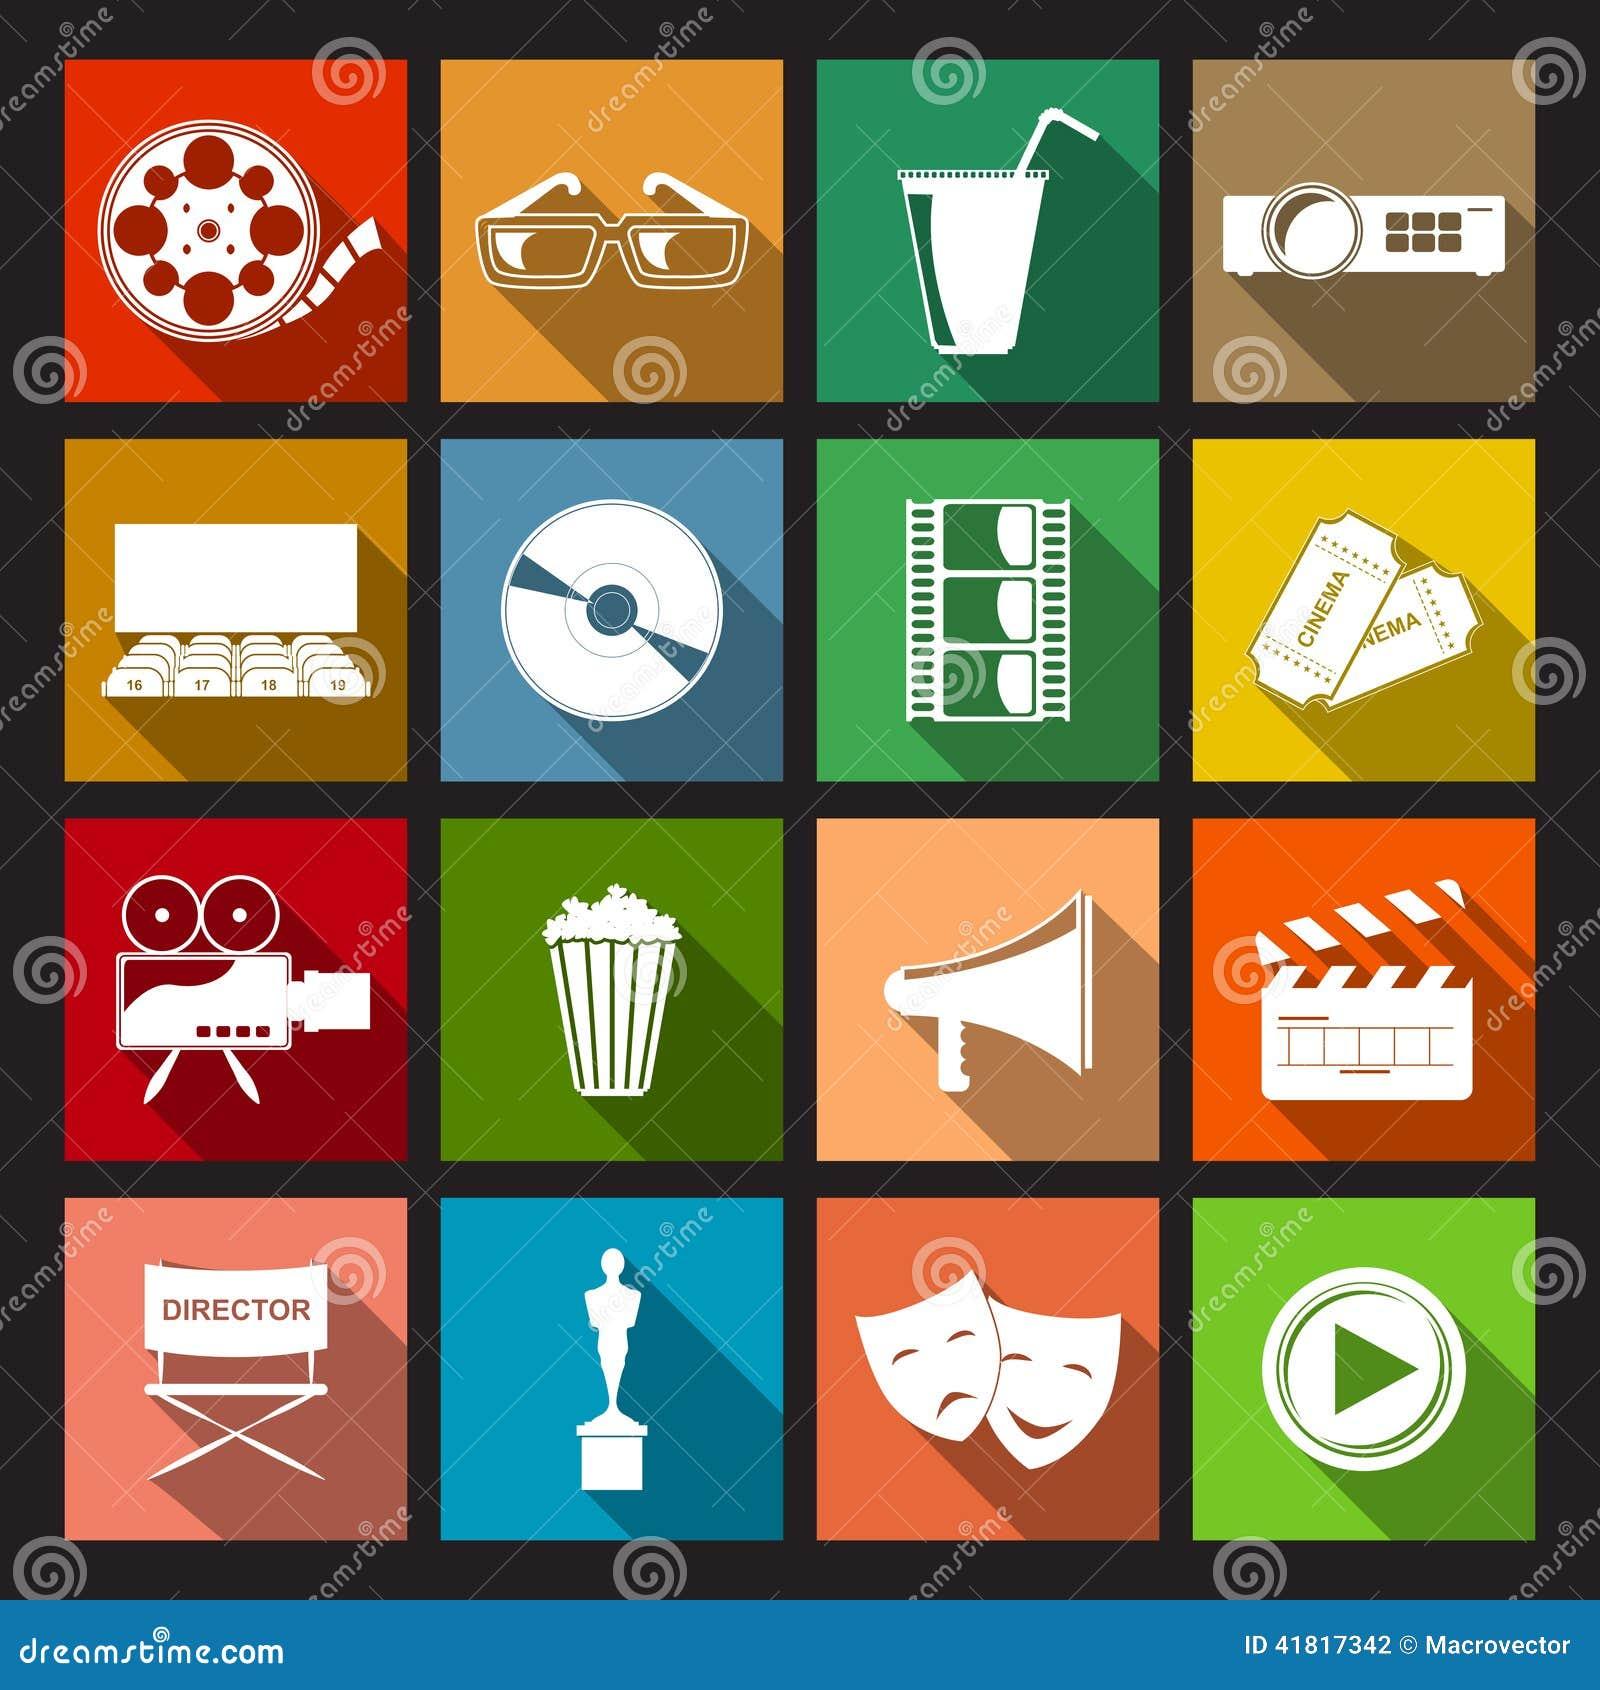 Cinema Icons Flat Stock Vector - Image: 41817342